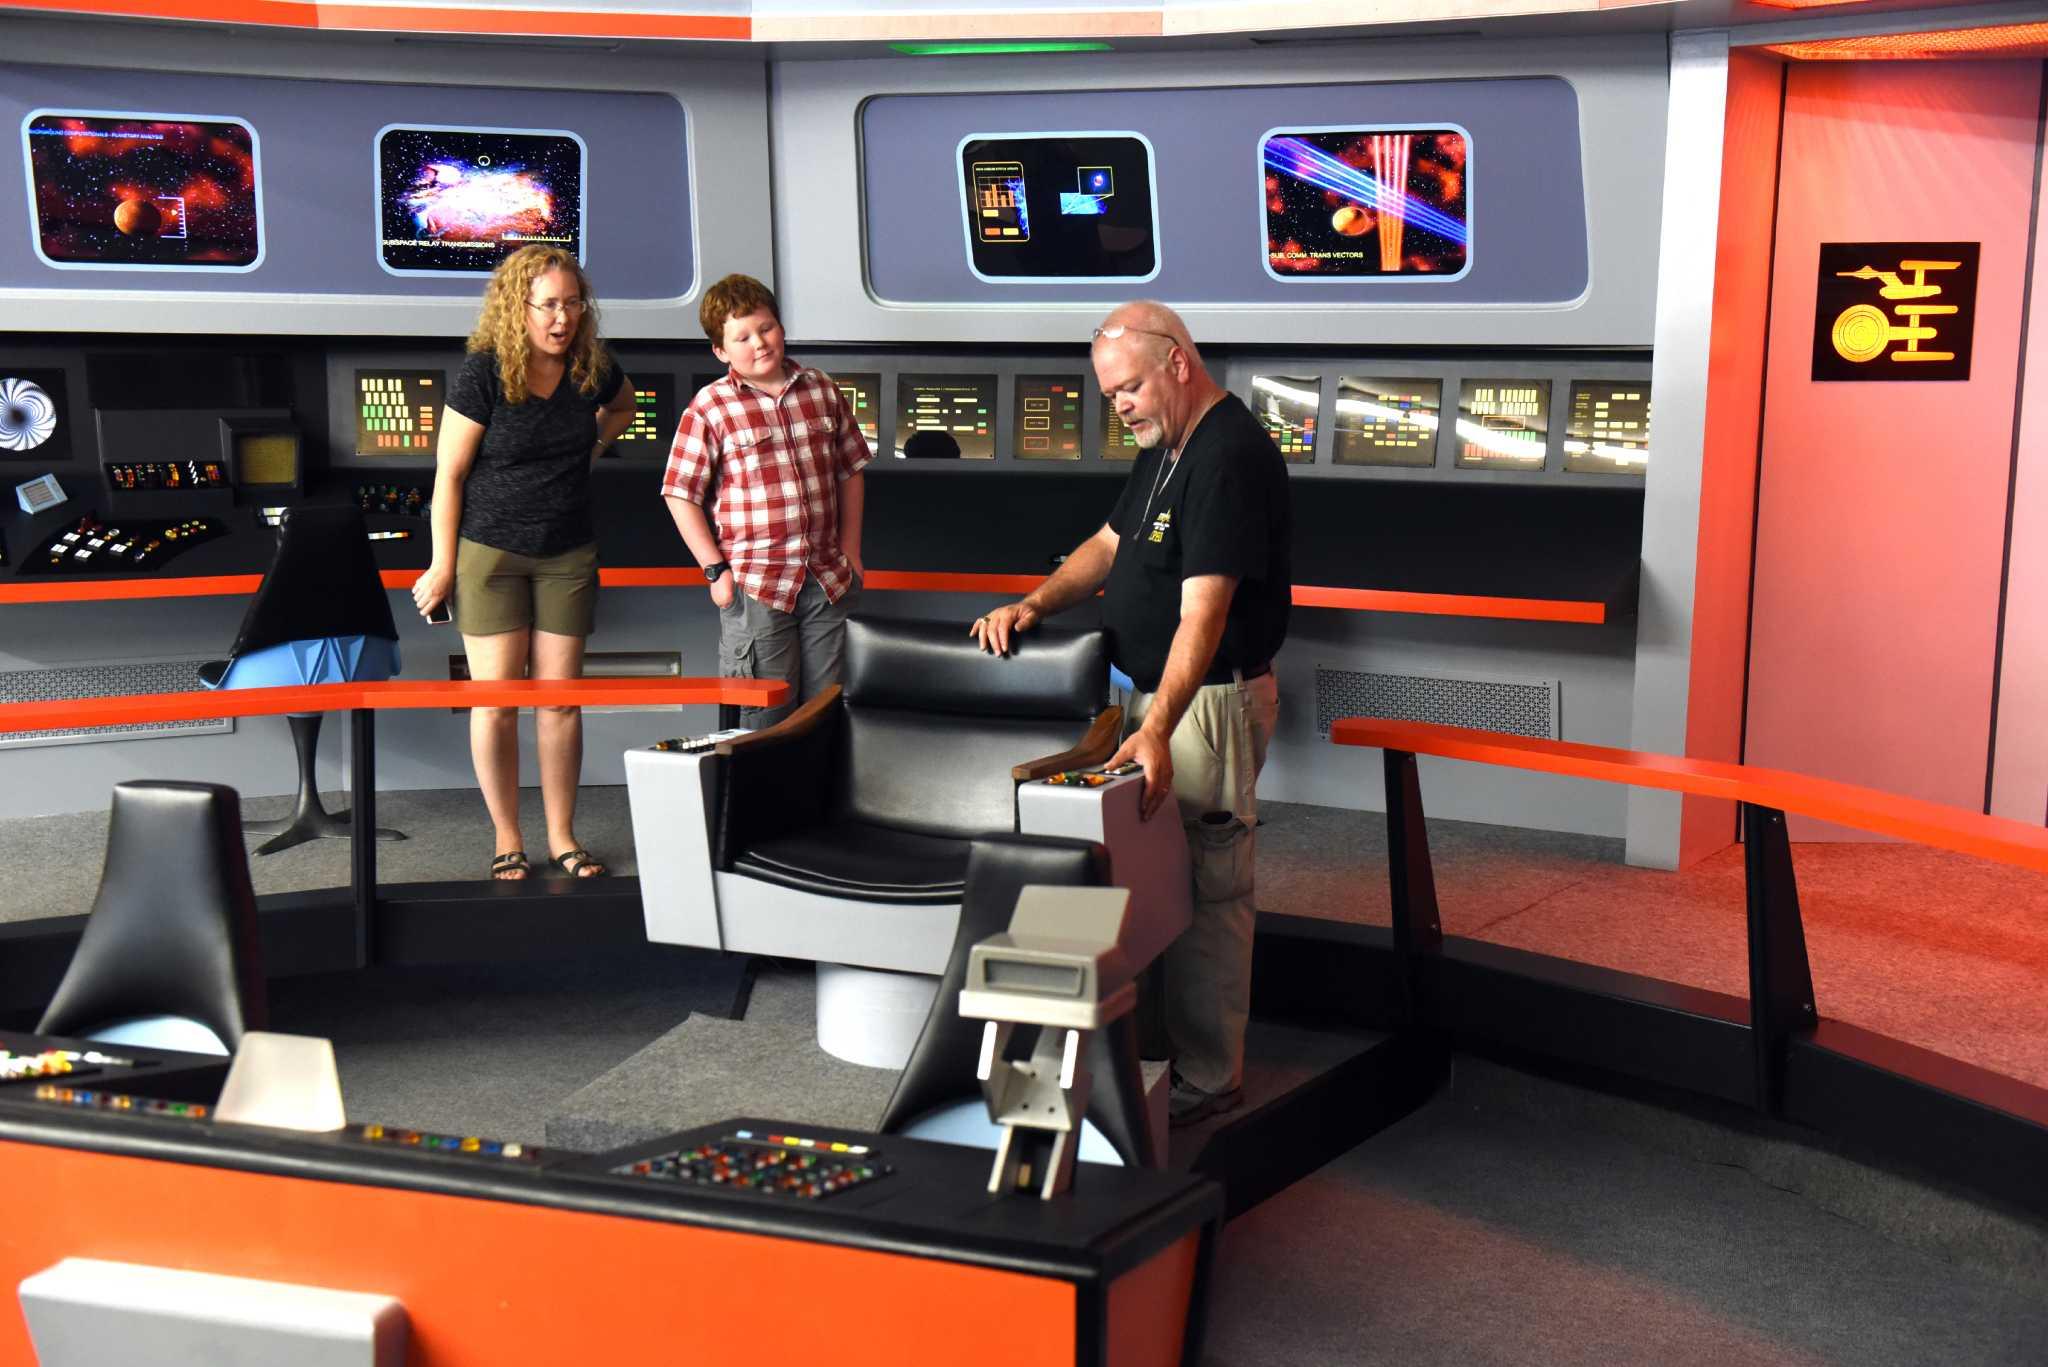 Replica Of Star Trek S U S S Enterprise Boldly Goes Into